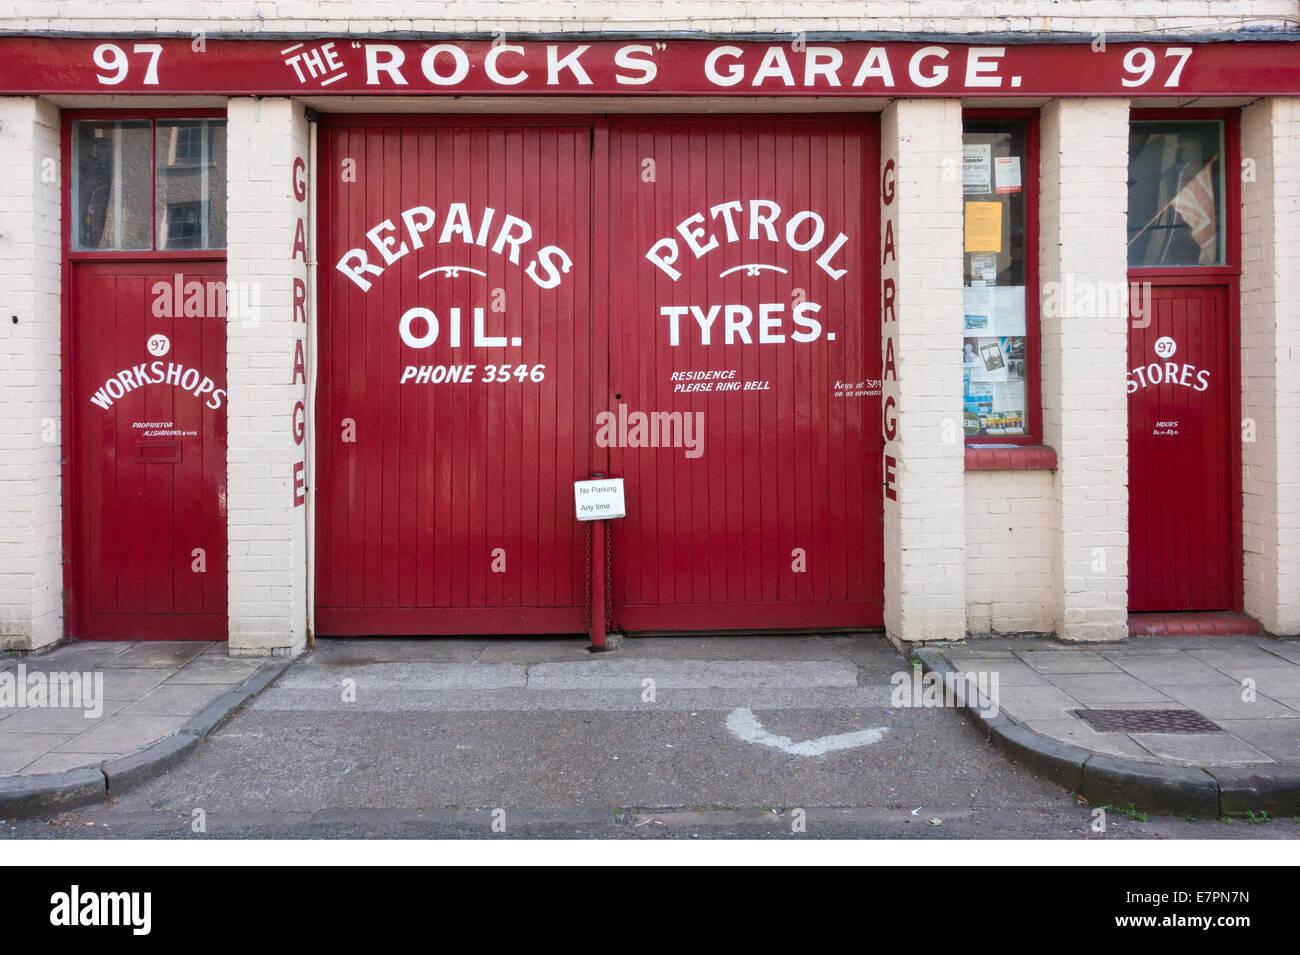 Artwork doors of Rocks Garage in Clifton village Bristol - Stock Image